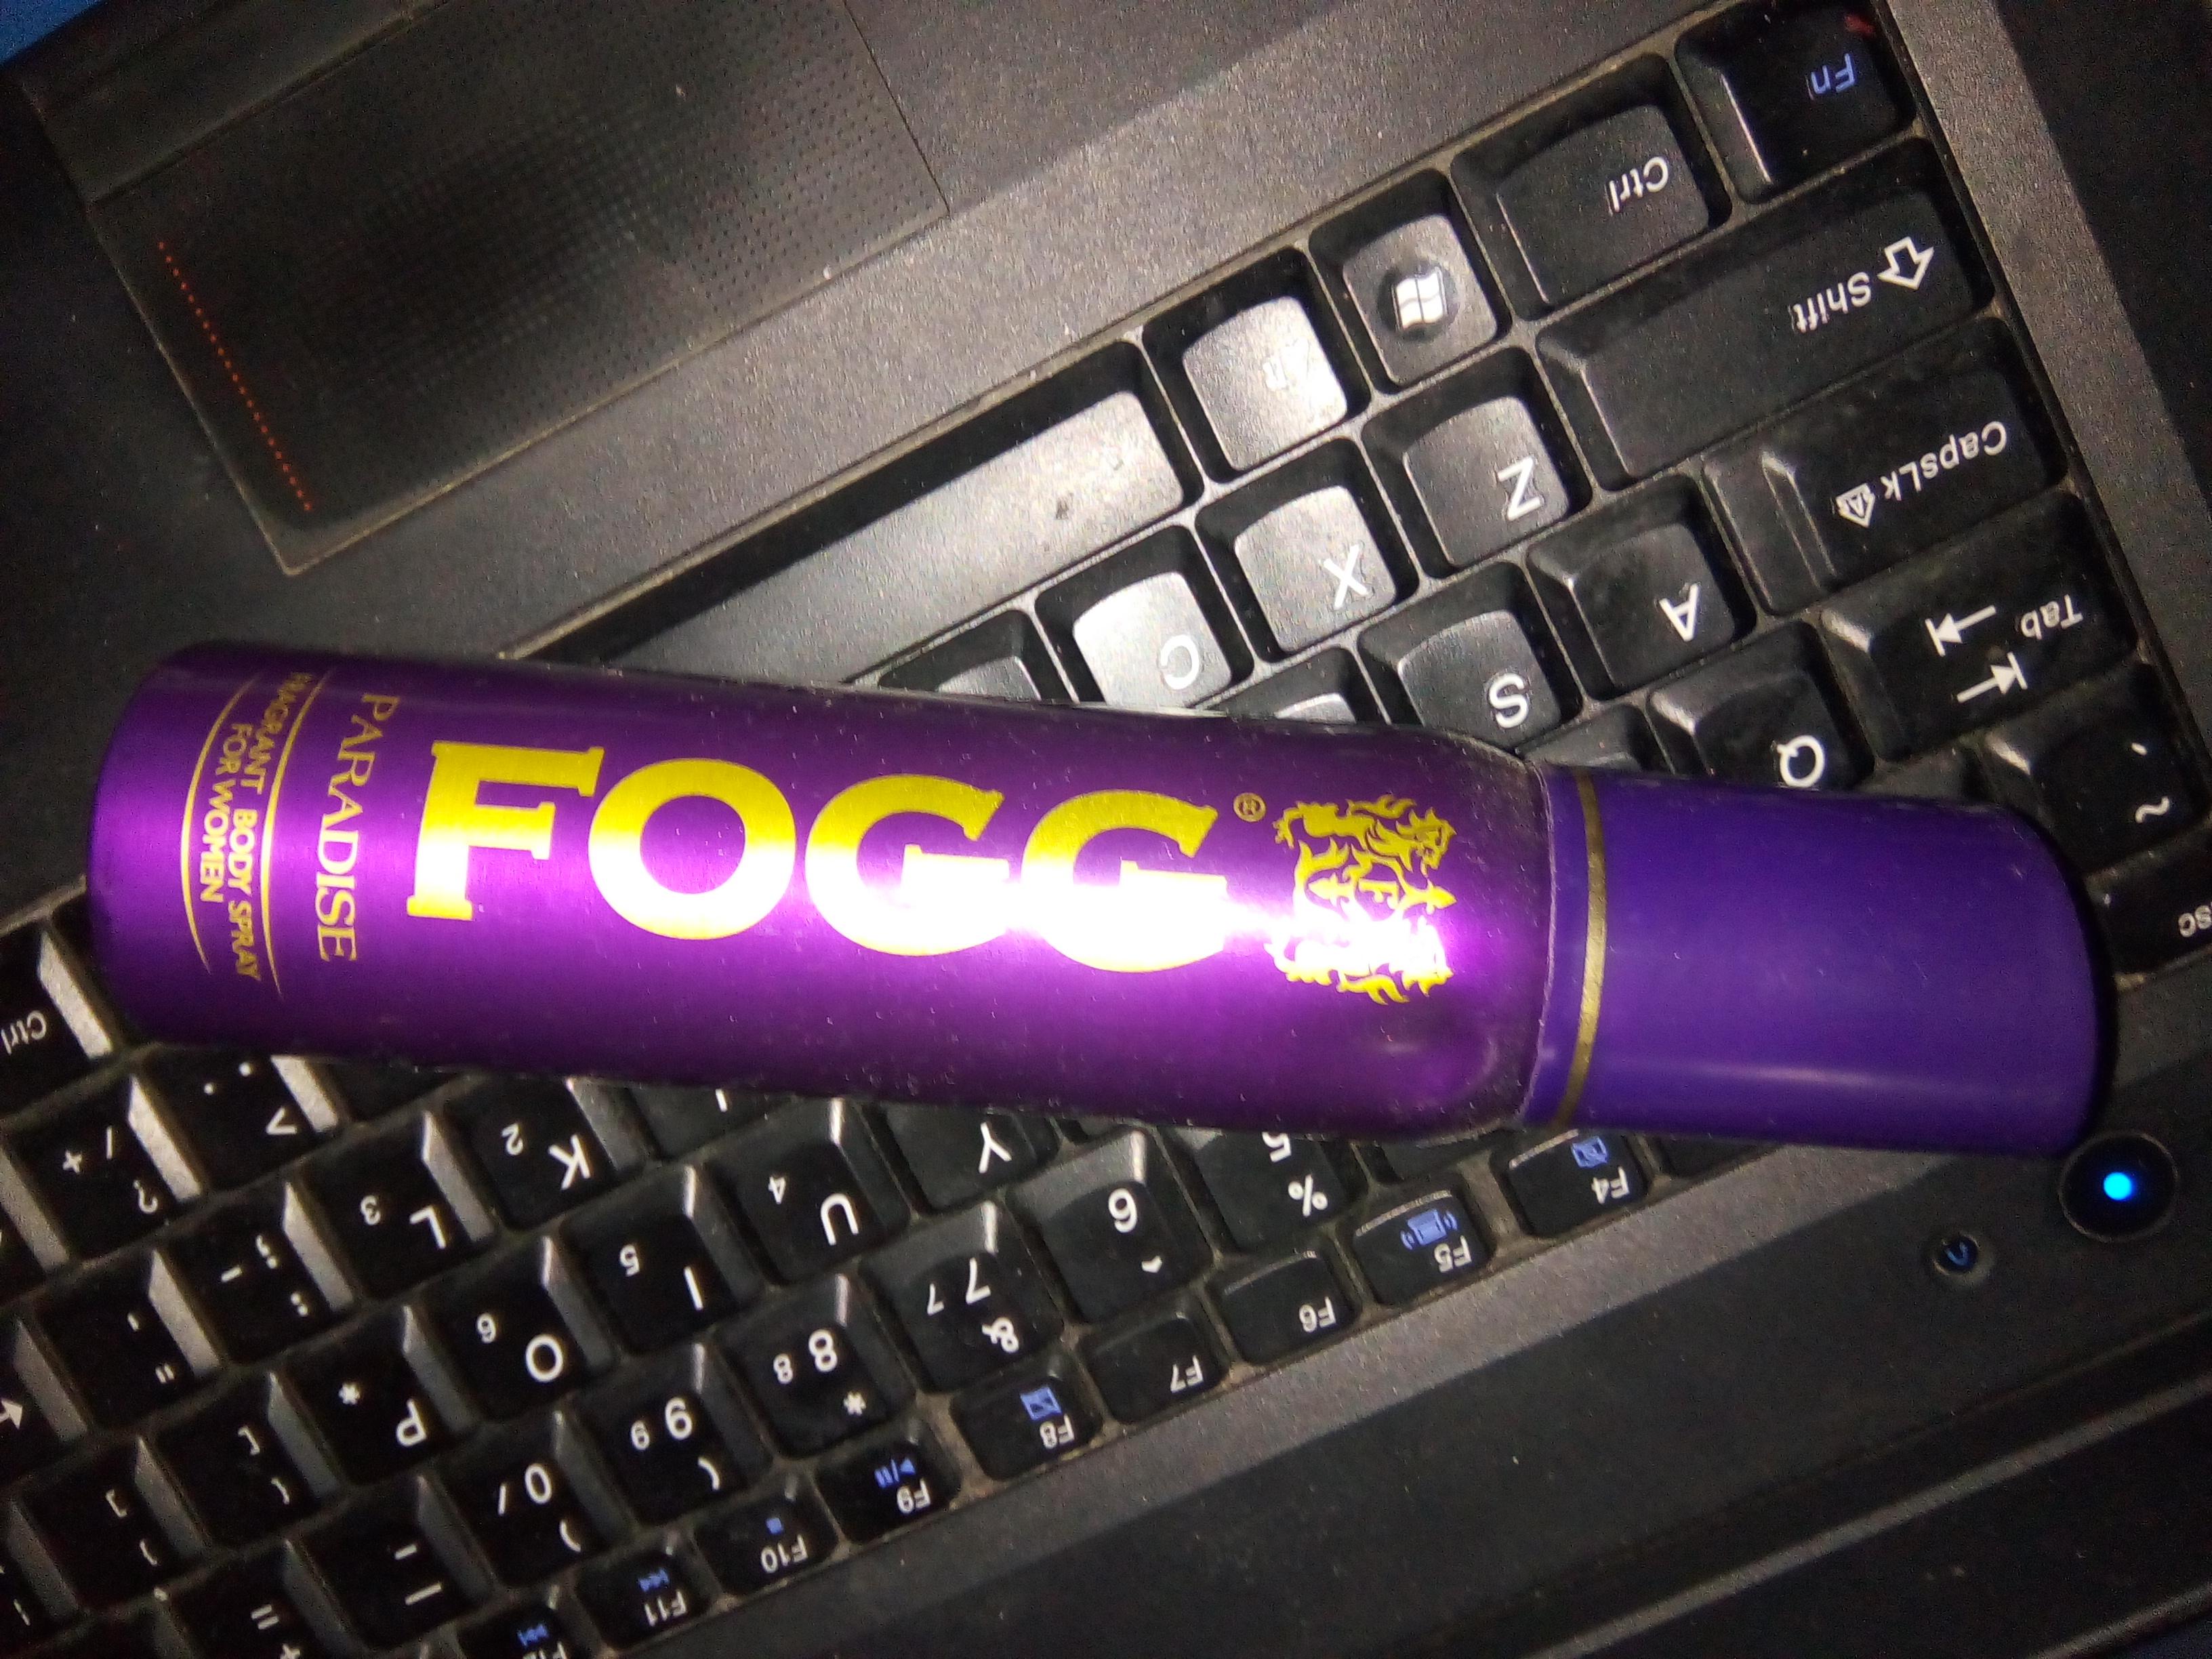 Fogg Paradise Body Spray For Women-Deodorant spray for women-By aneesha